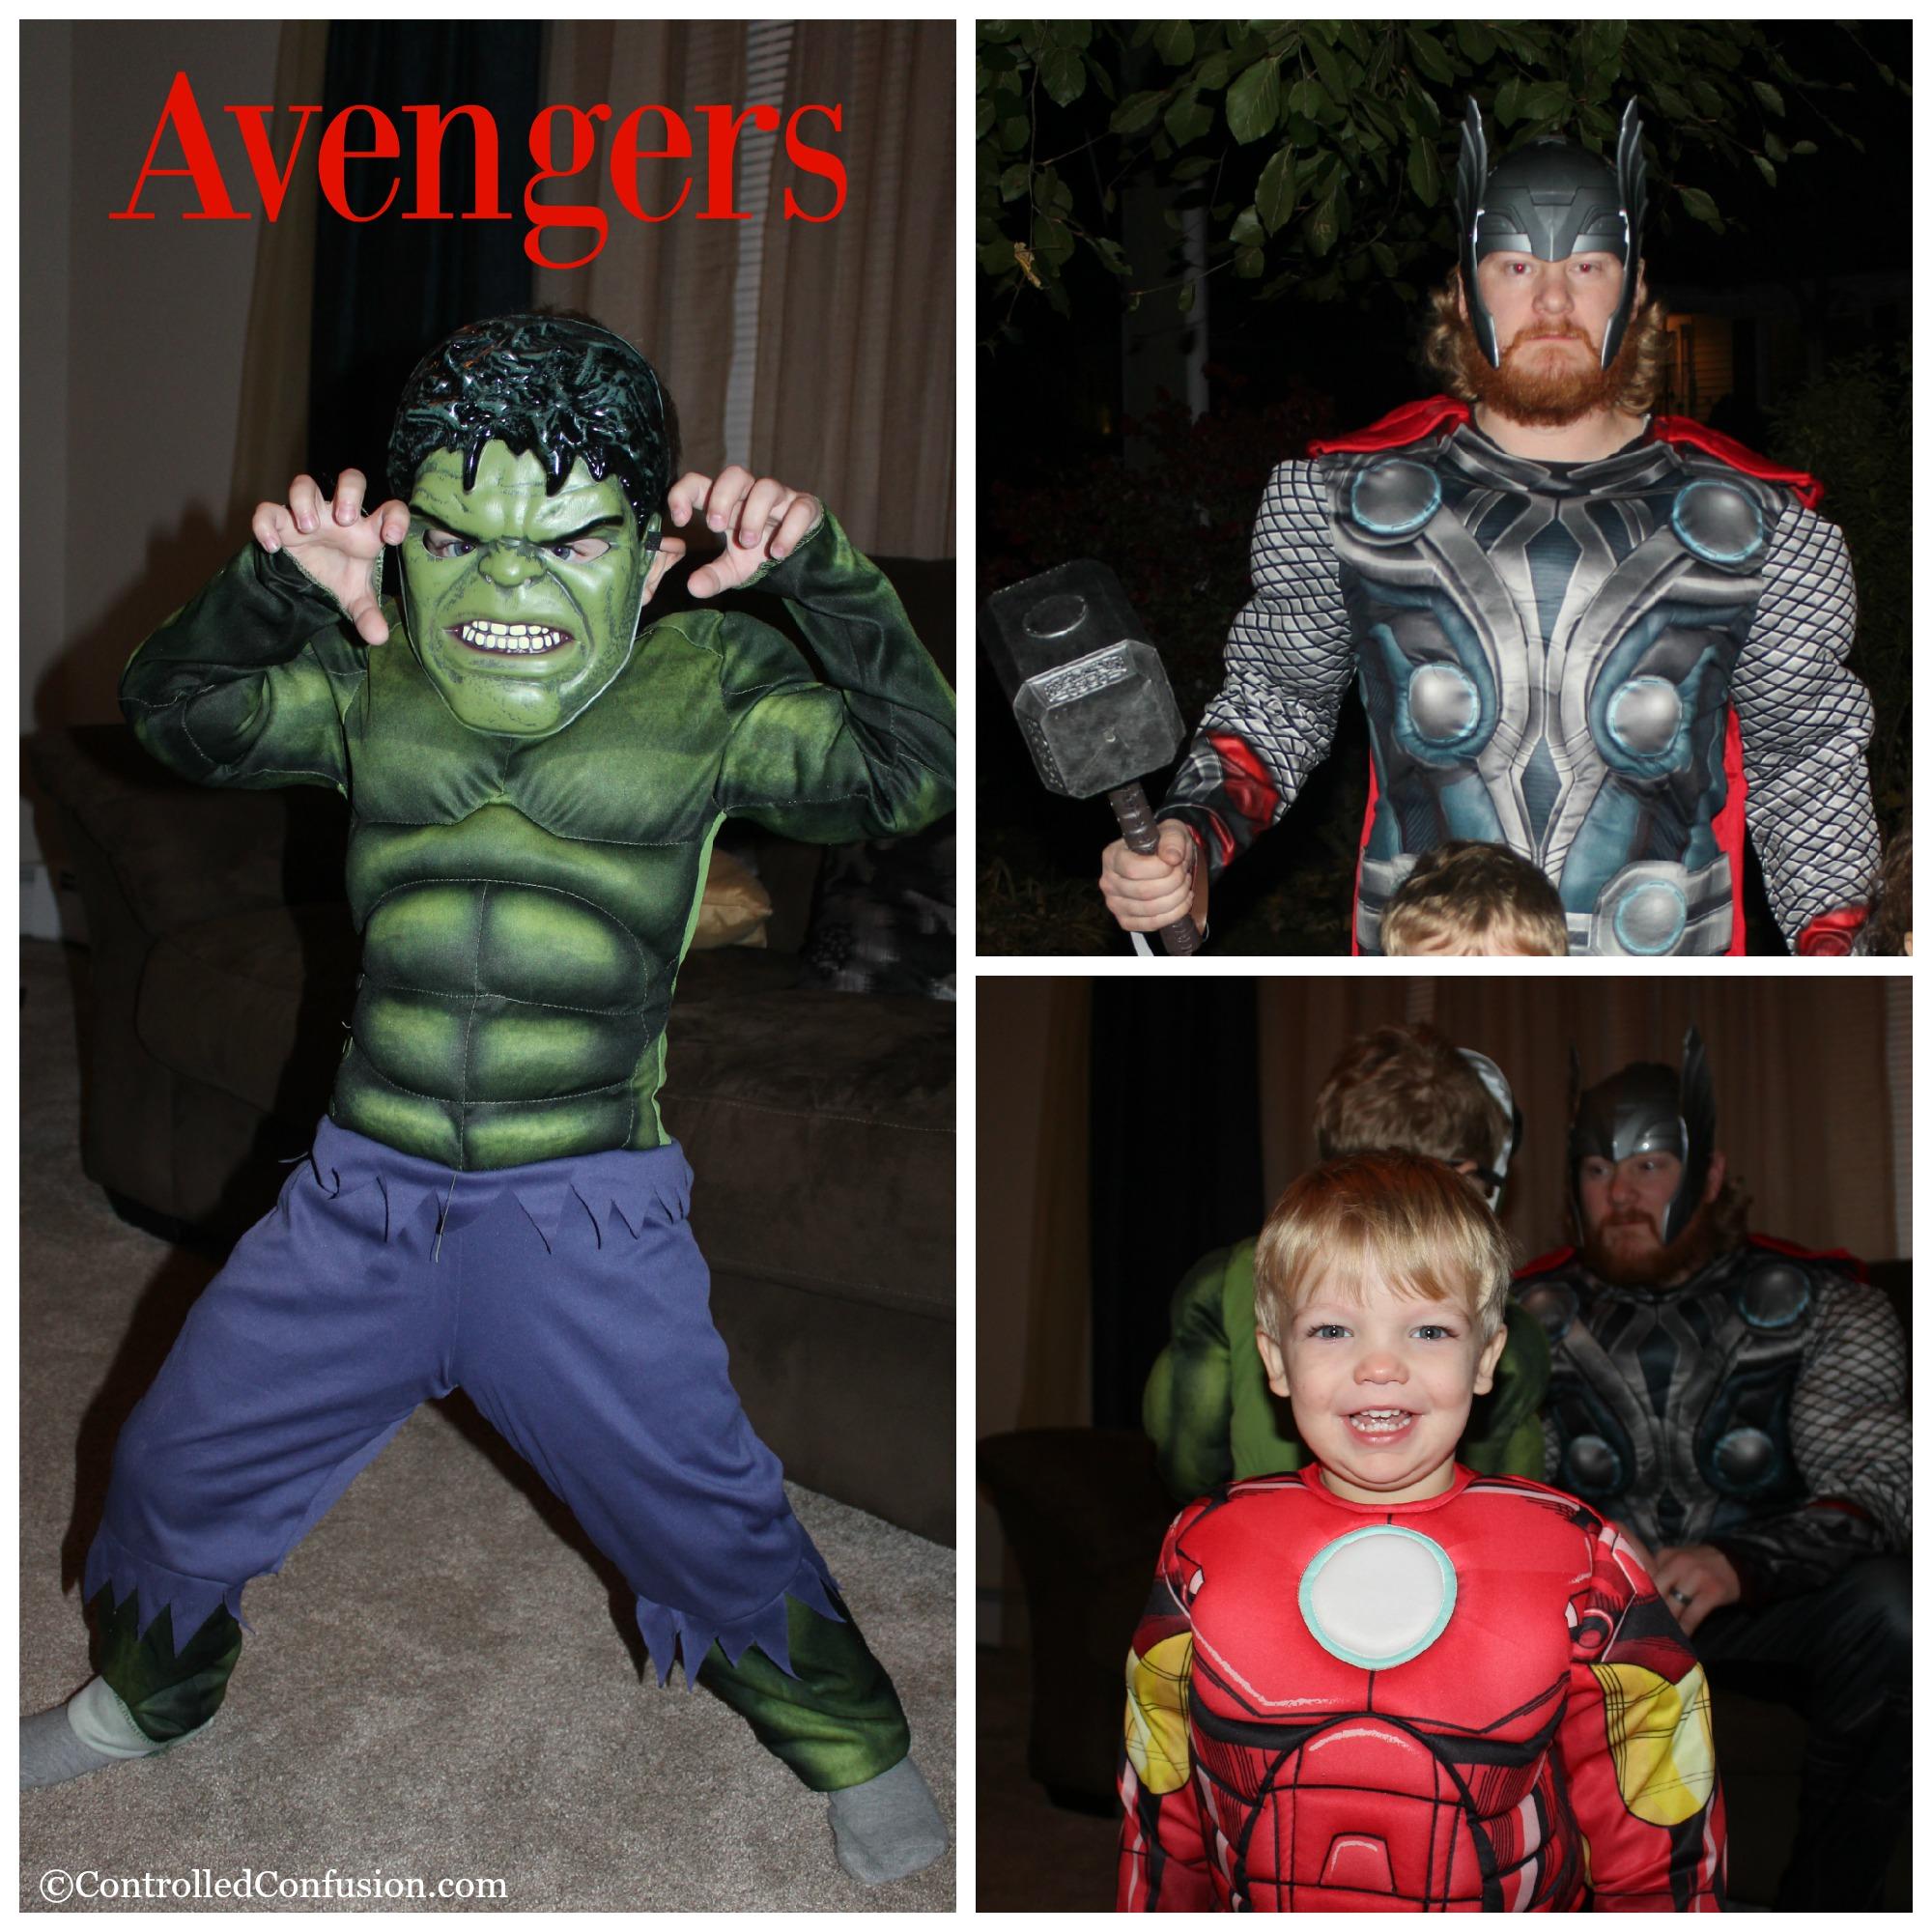 A Team of Avengers